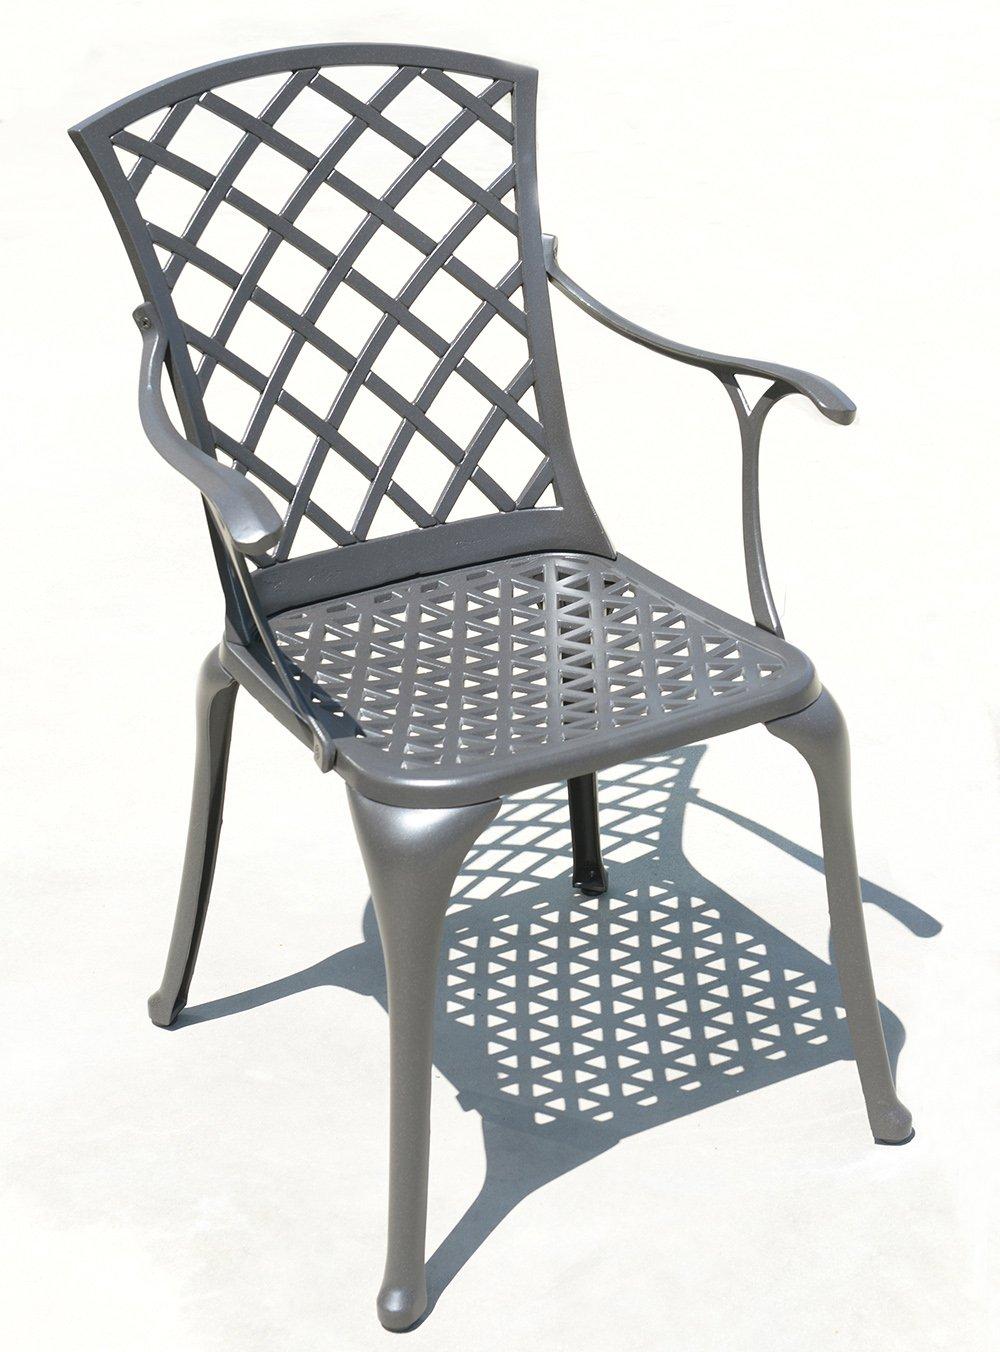 Two of MEMPHIS EX01002C Cast Aluminum Outdoor Arm Chair, Bronze Finish FREE Shipping, 2 PCS SET